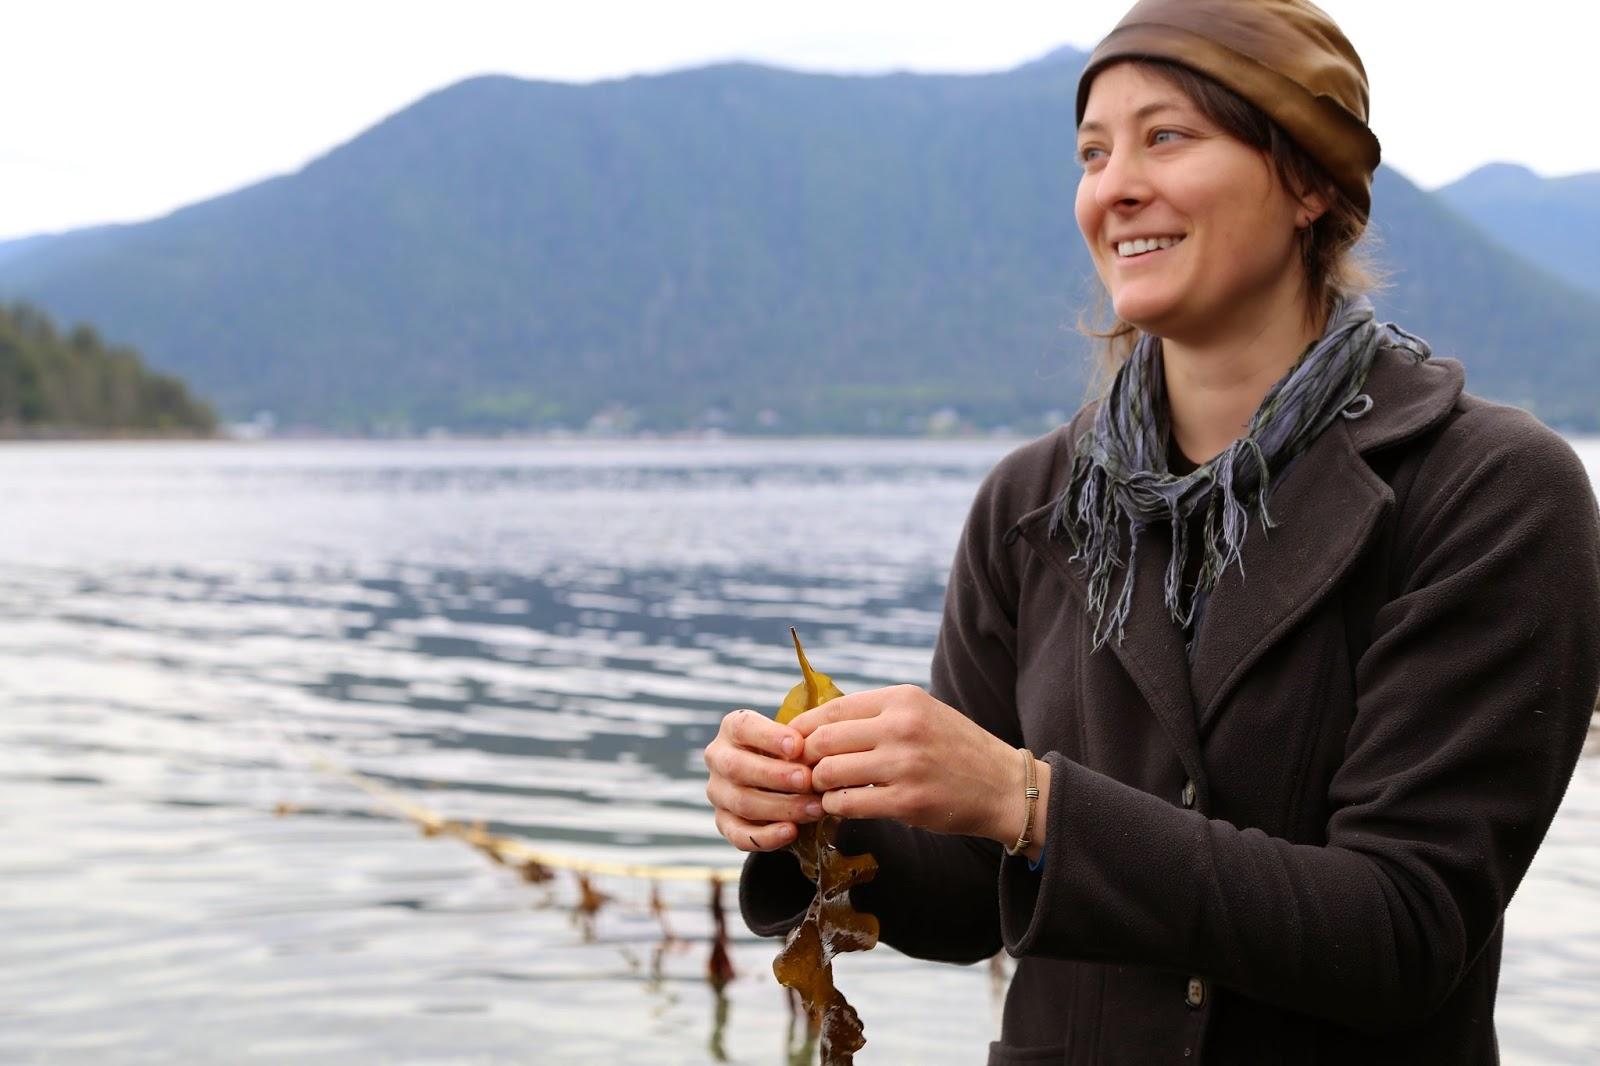 Hope Merritt, gathering seaweed, Sitka, , Alaska pic: Kerstin Rodgers/msmarmitelover.com